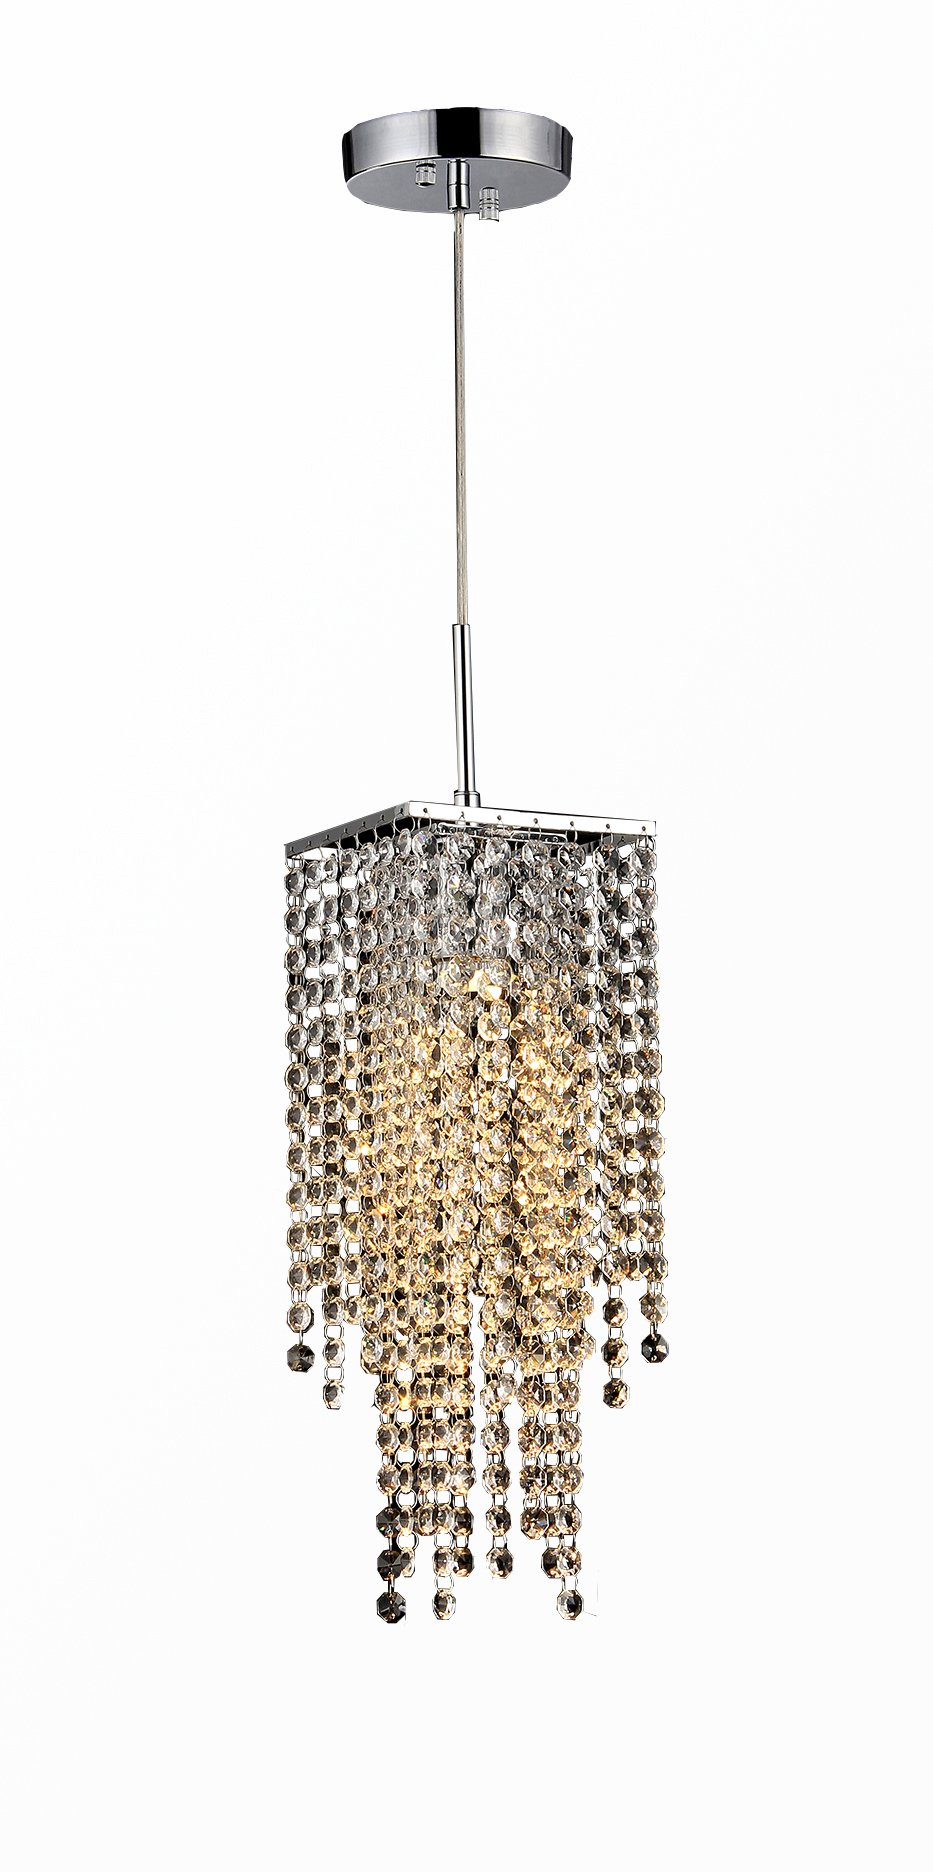 Whse of Tiffany RL8032 Sheea 1-Light Crystal Falls Chrome Chandelier